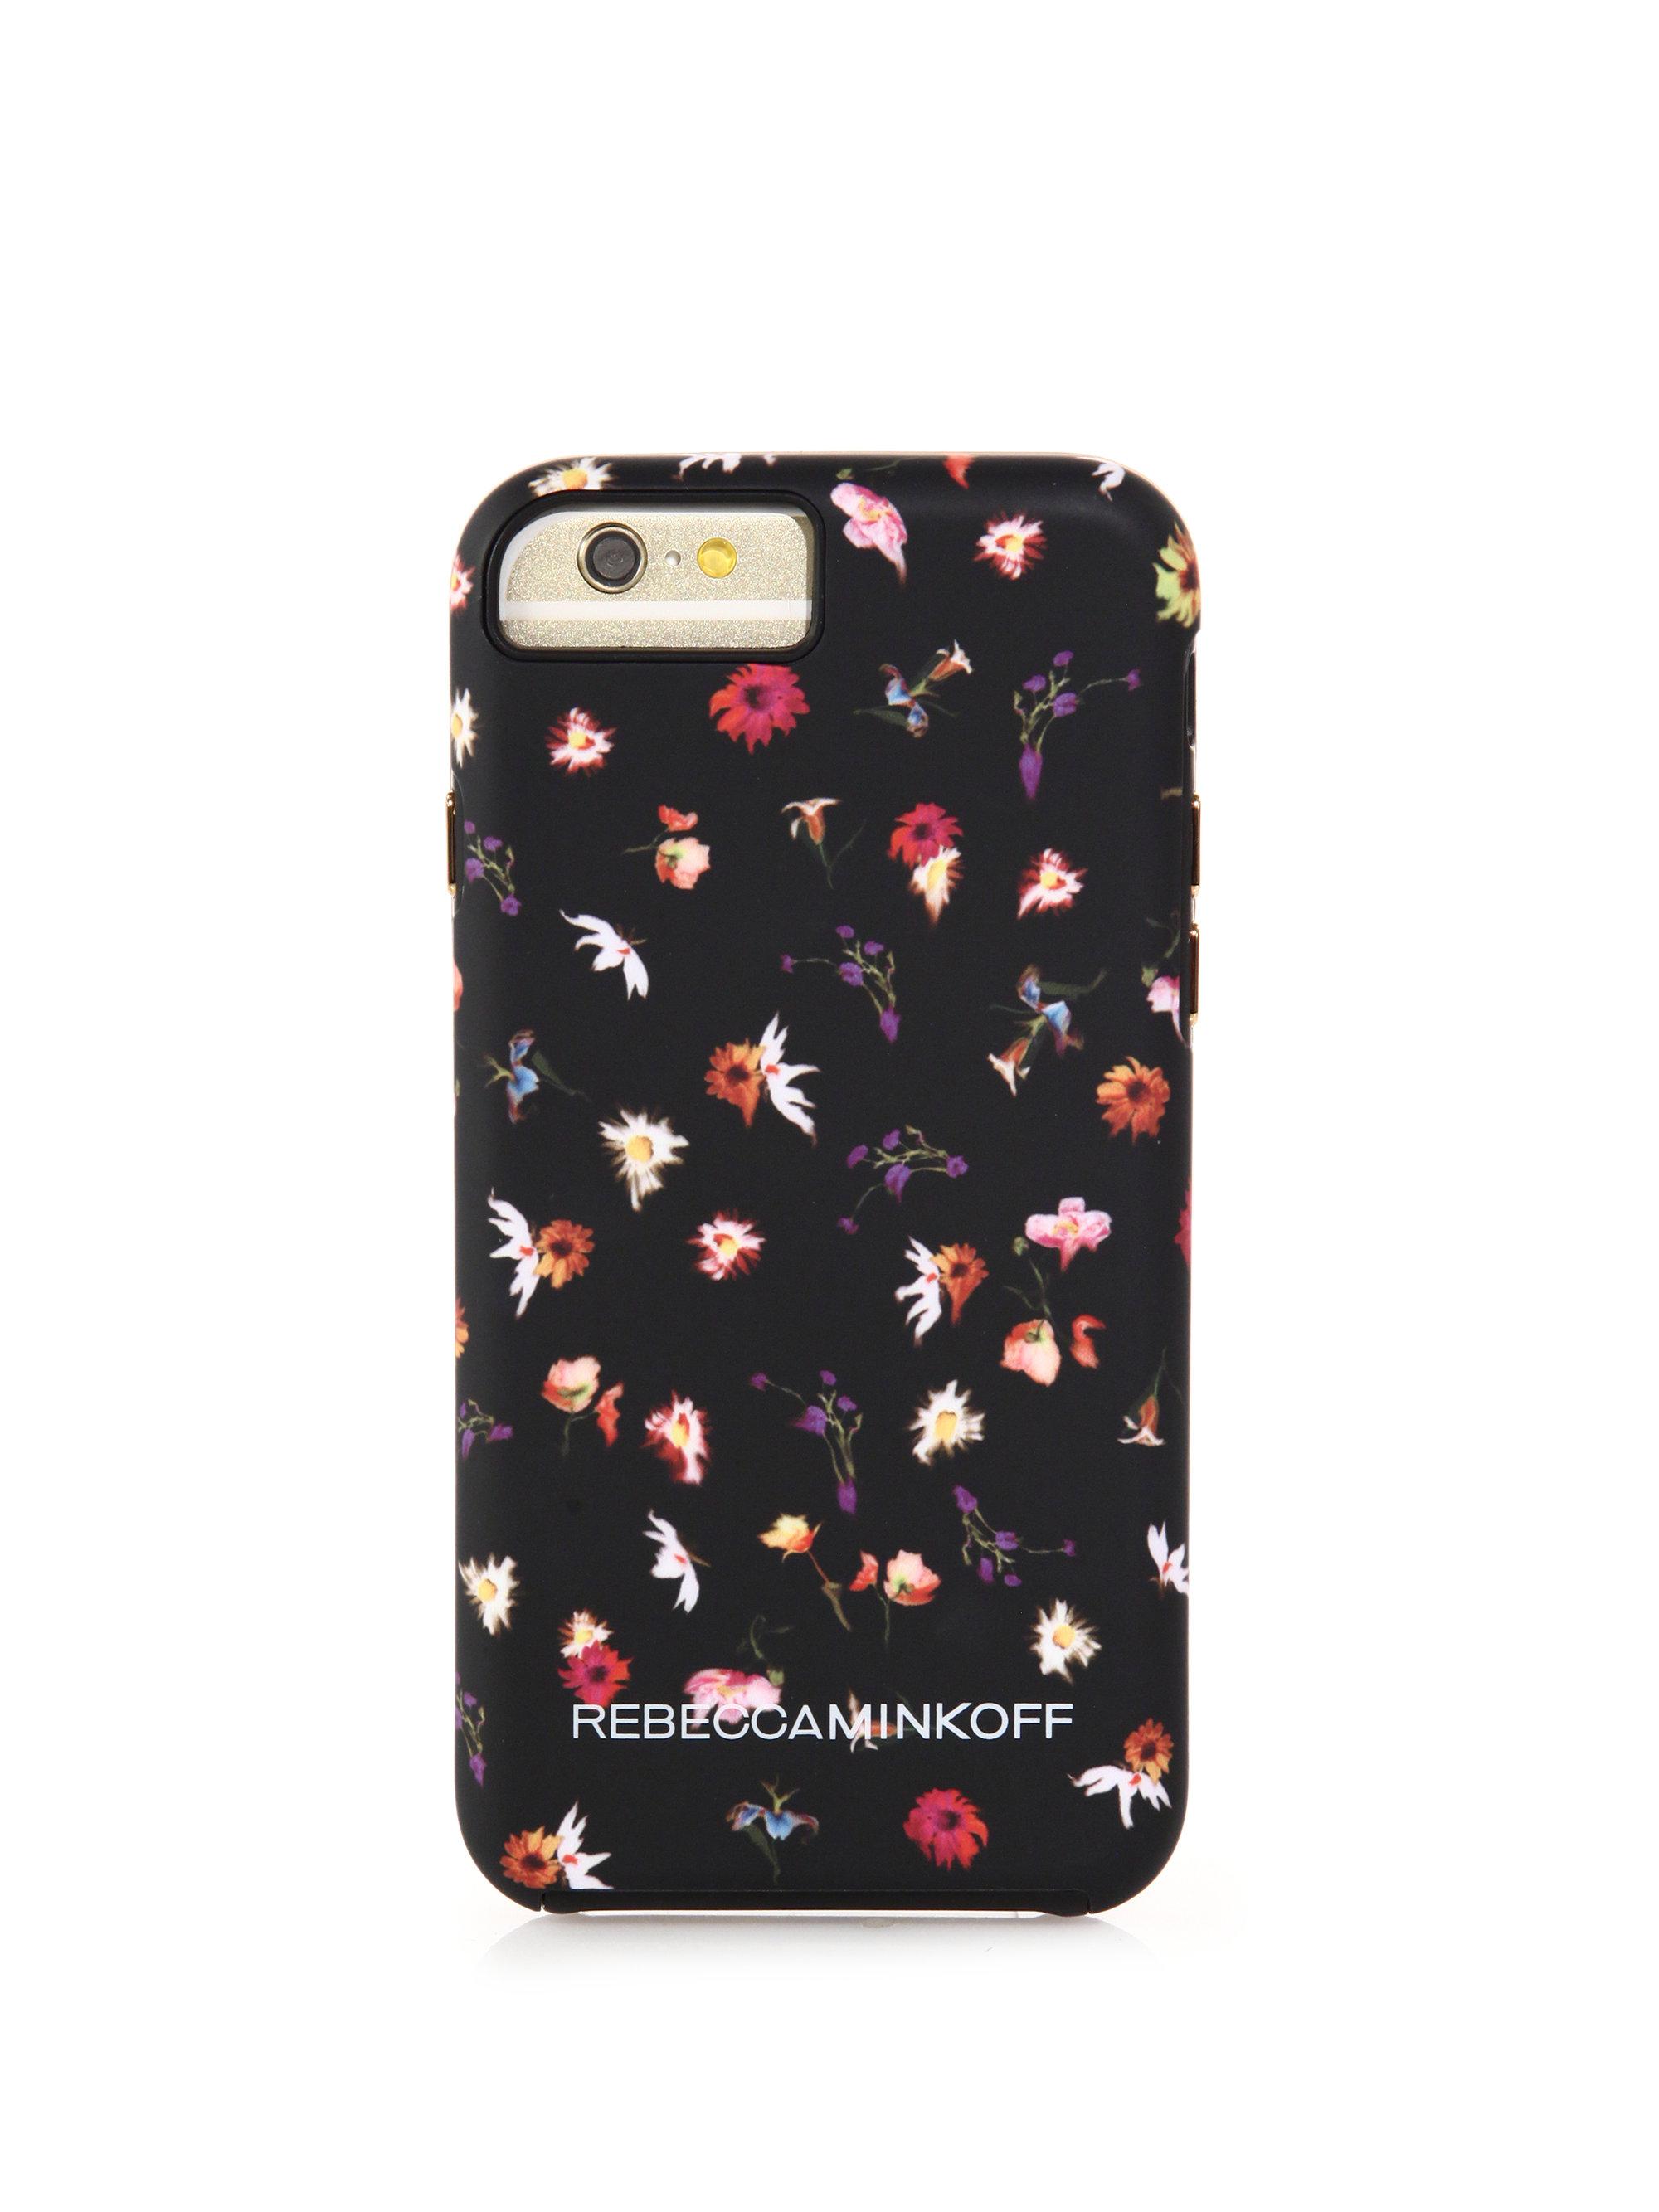 Lyst Rebecca Minkoff Floral Print Iphone 6 Case